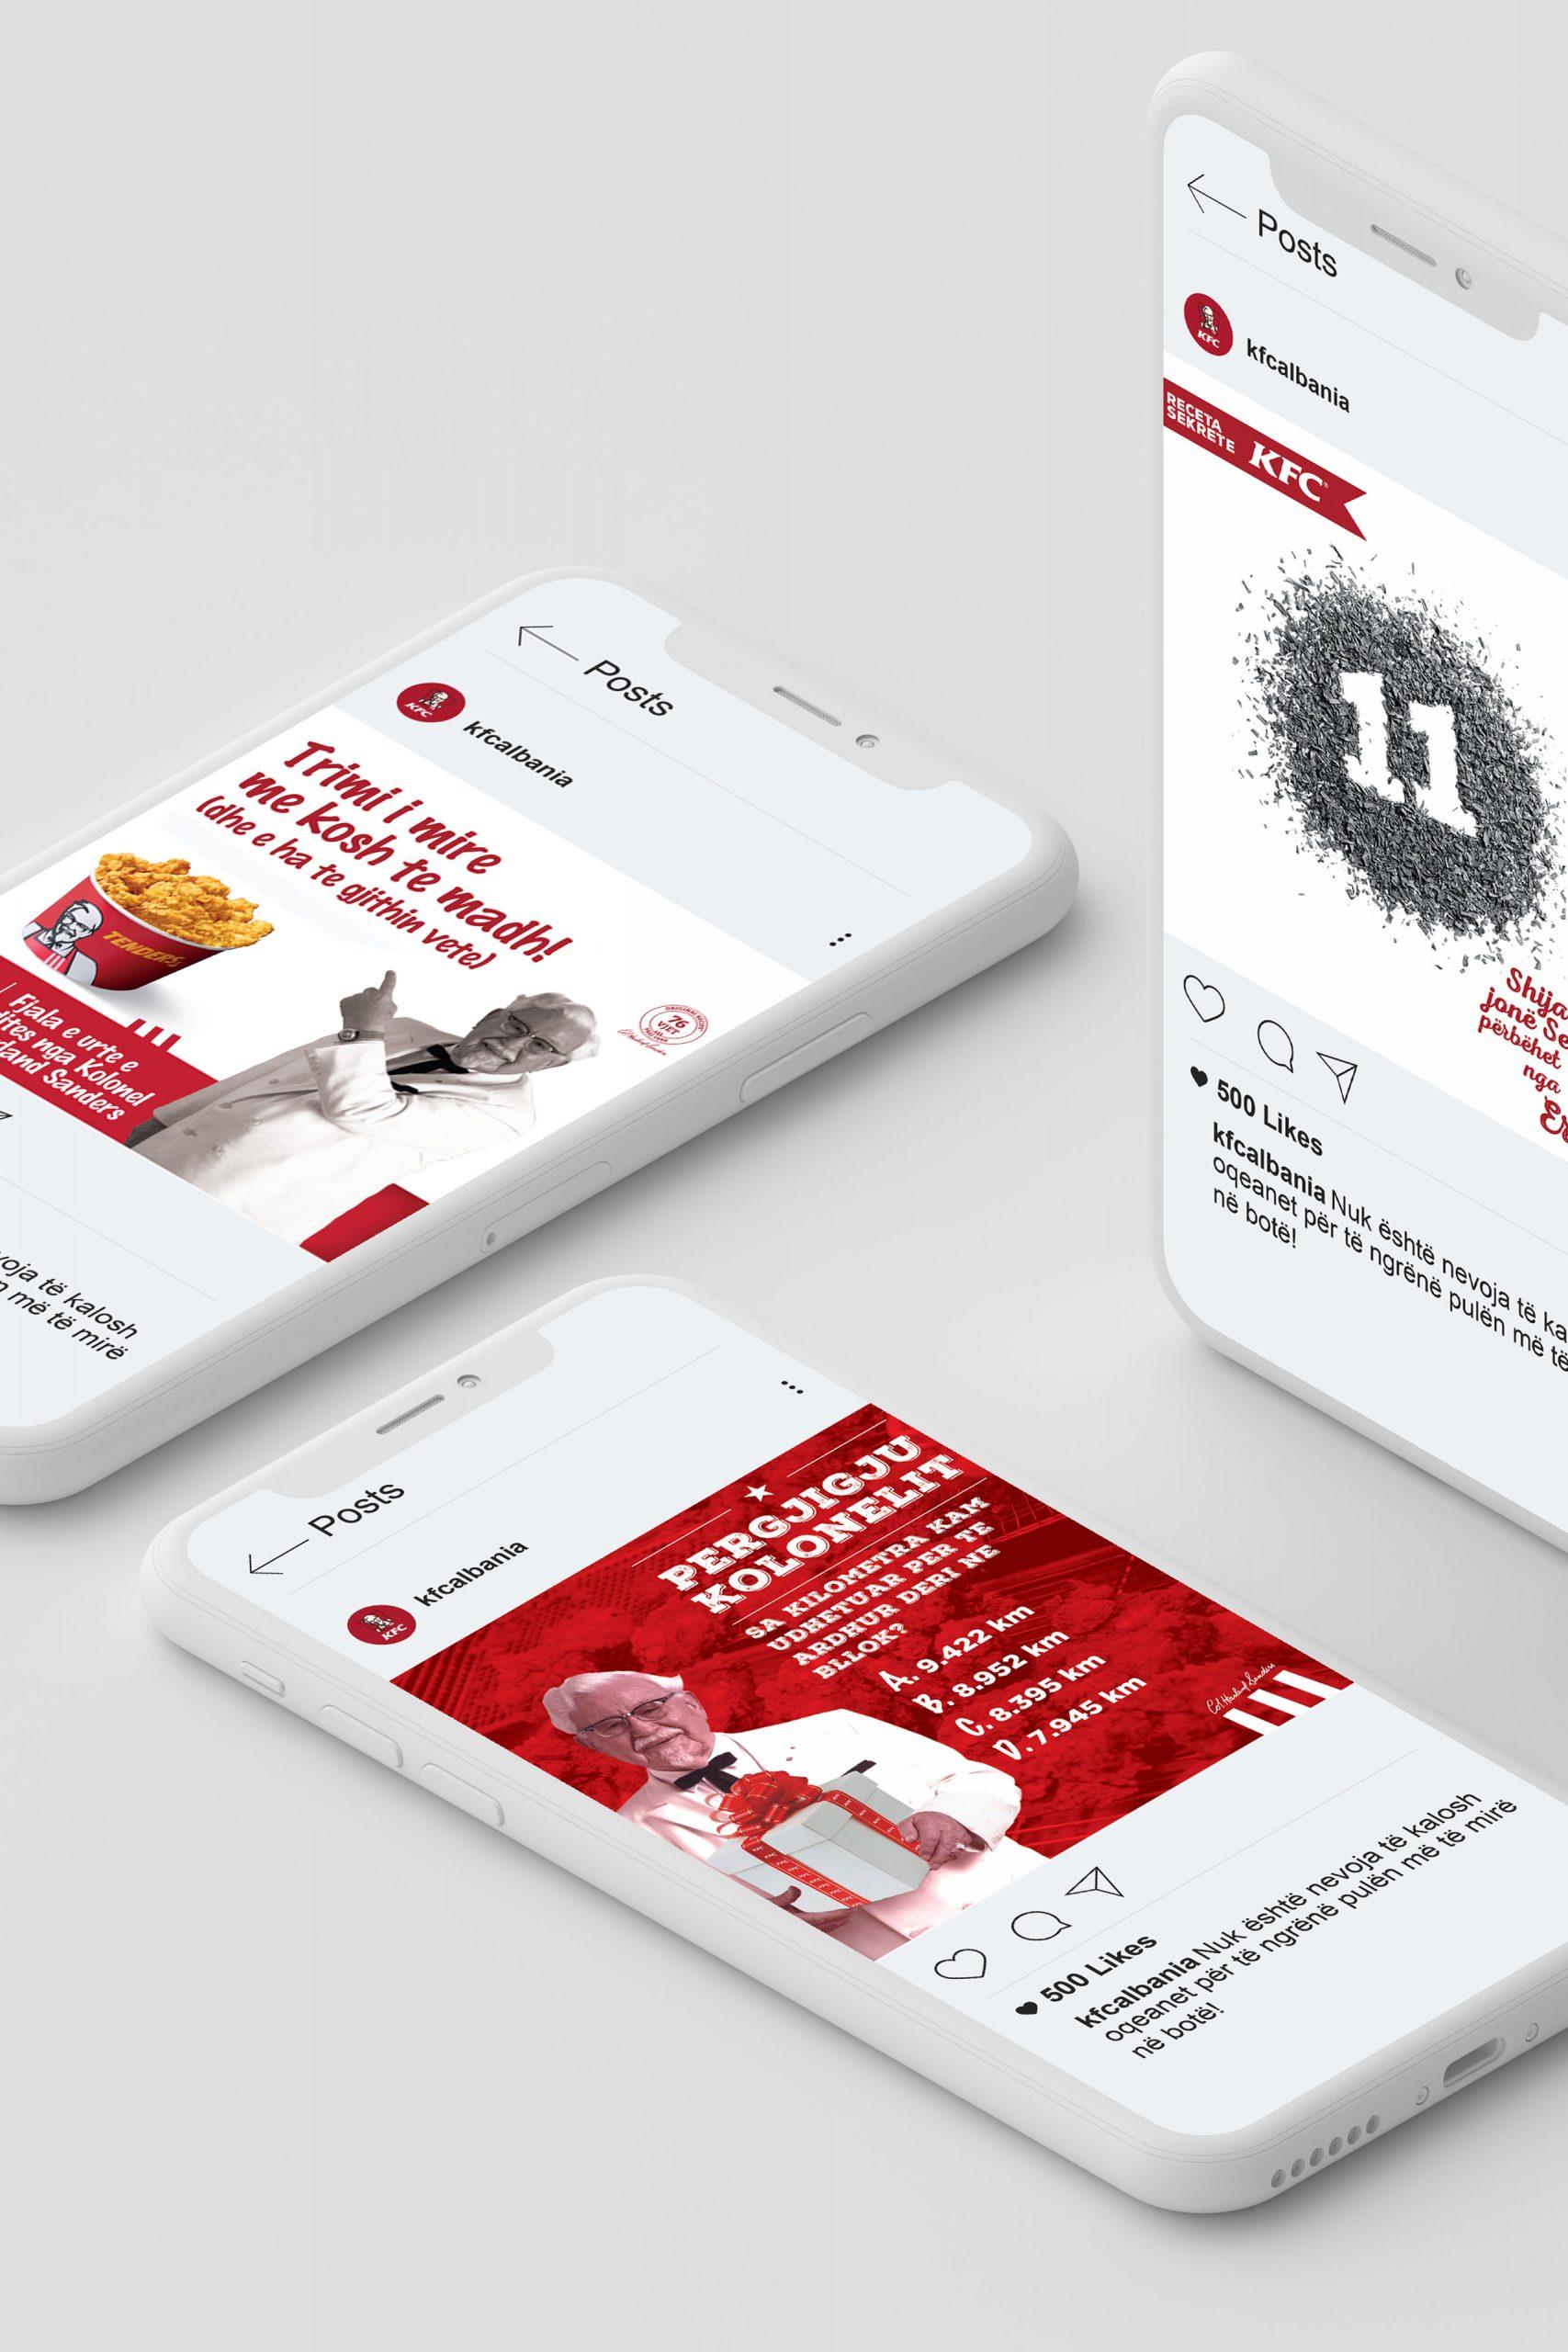 KFC Albania, Project Img 1 - Vatra Agency / Founder & CEO Gerton Bejo